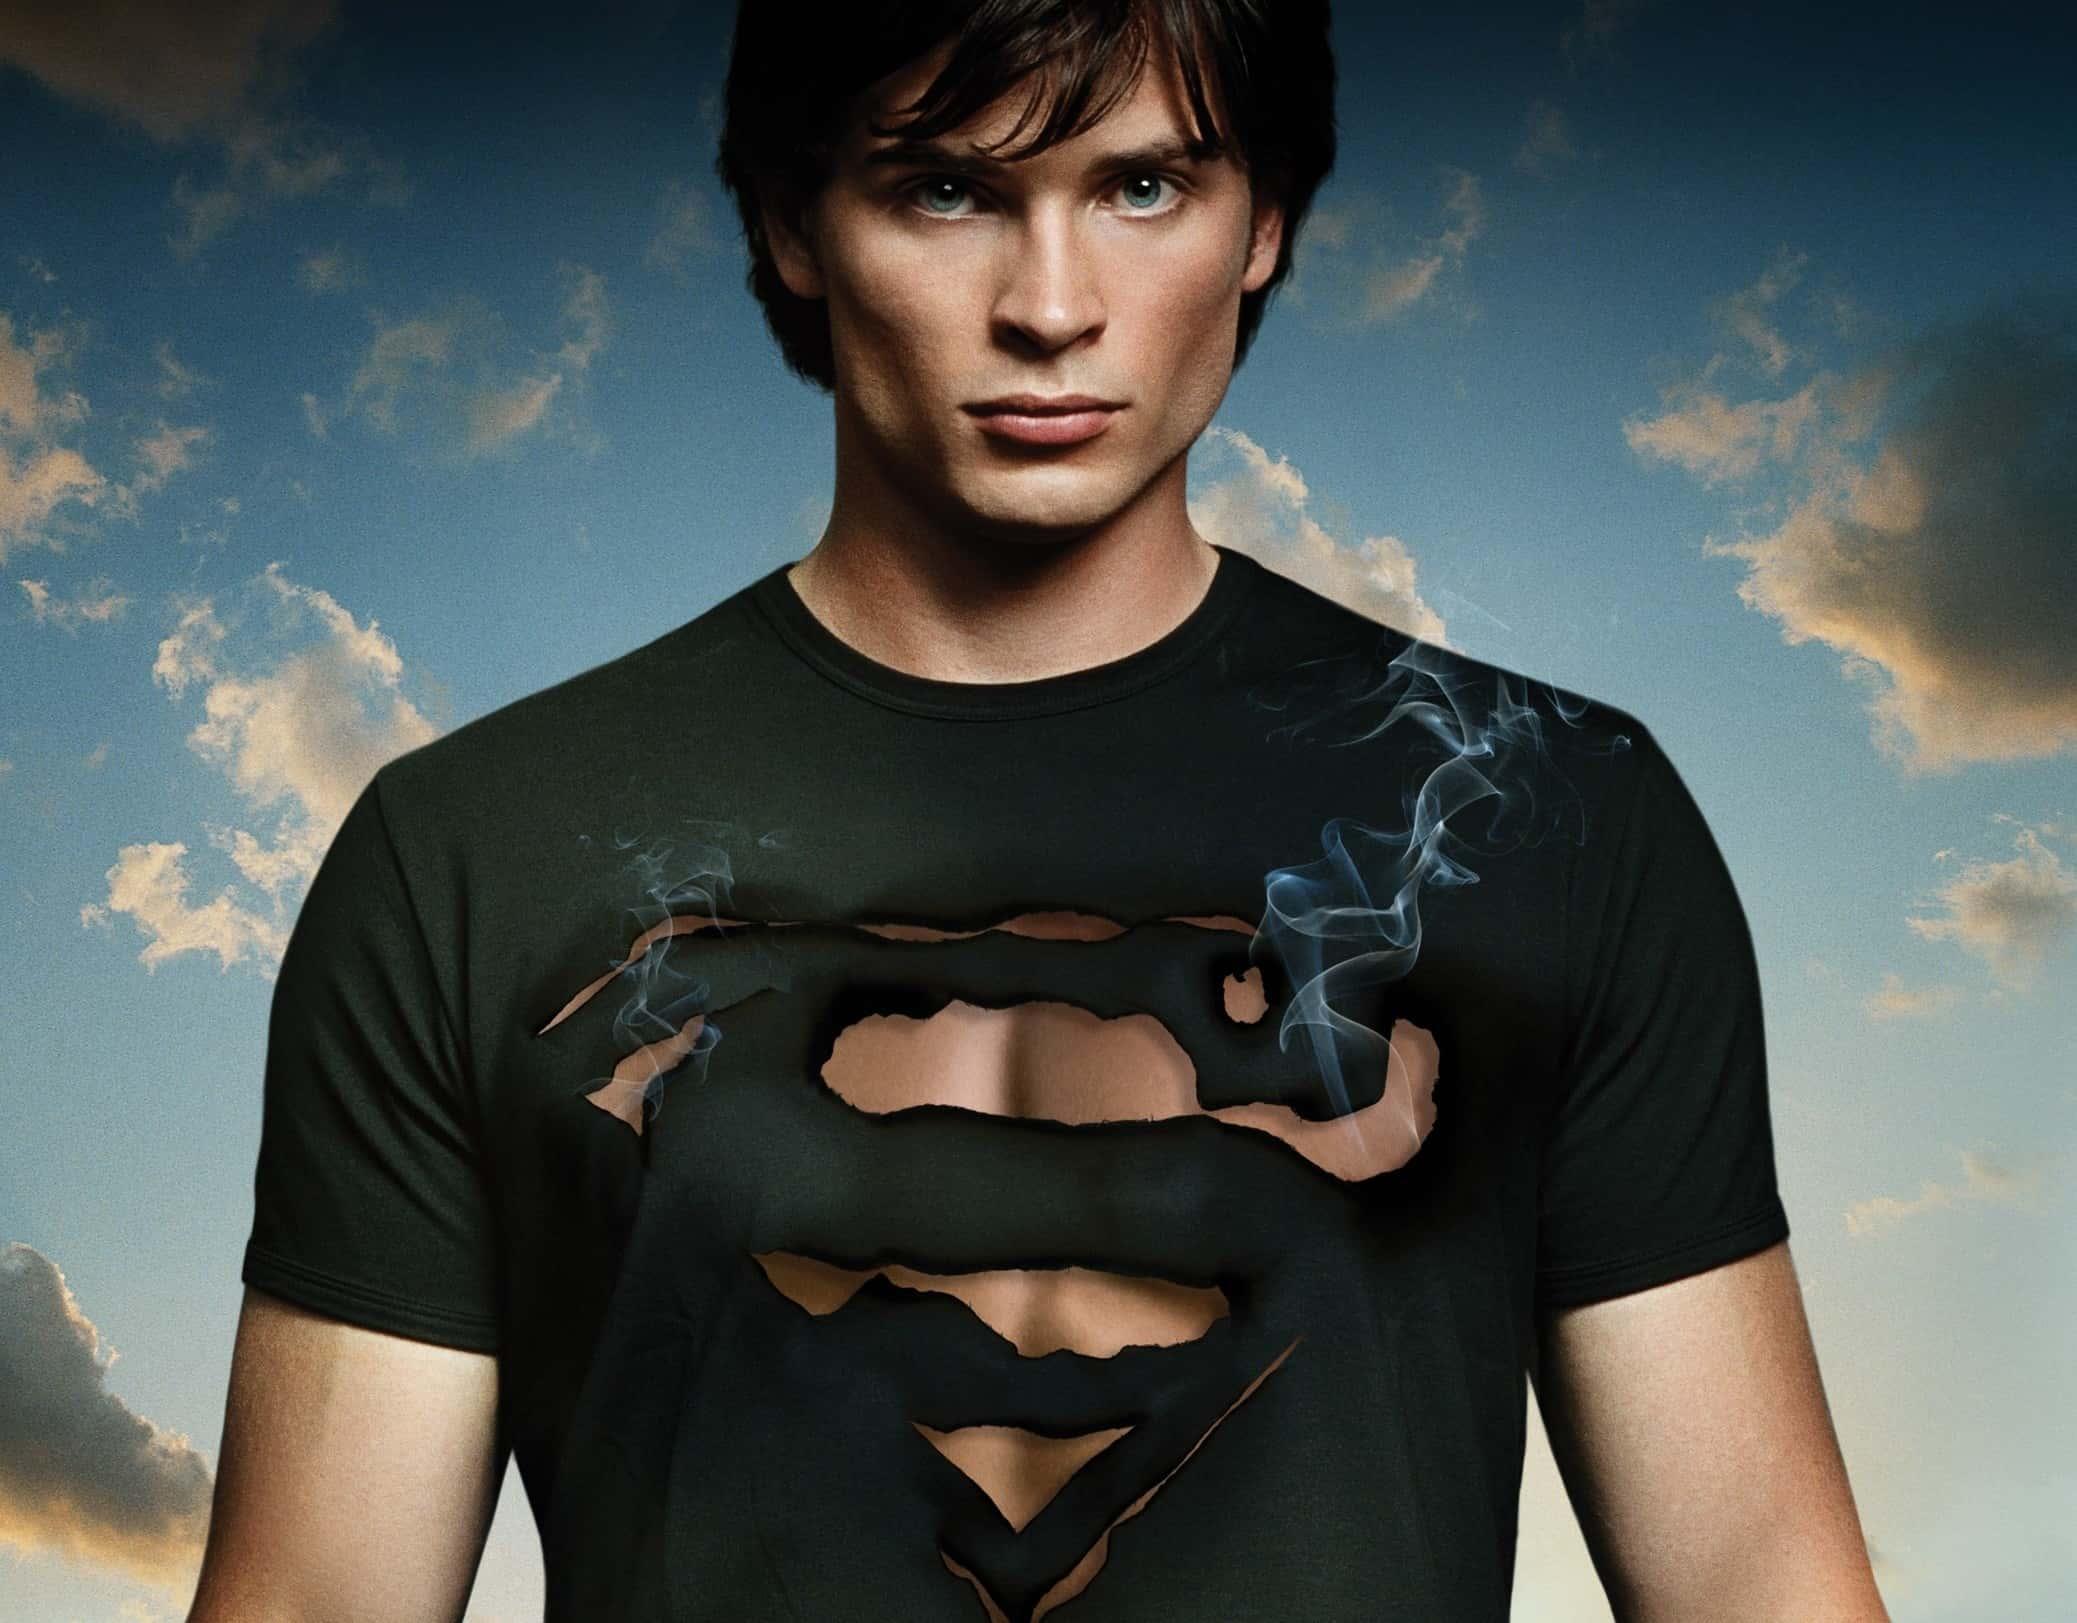 Smallville Facts